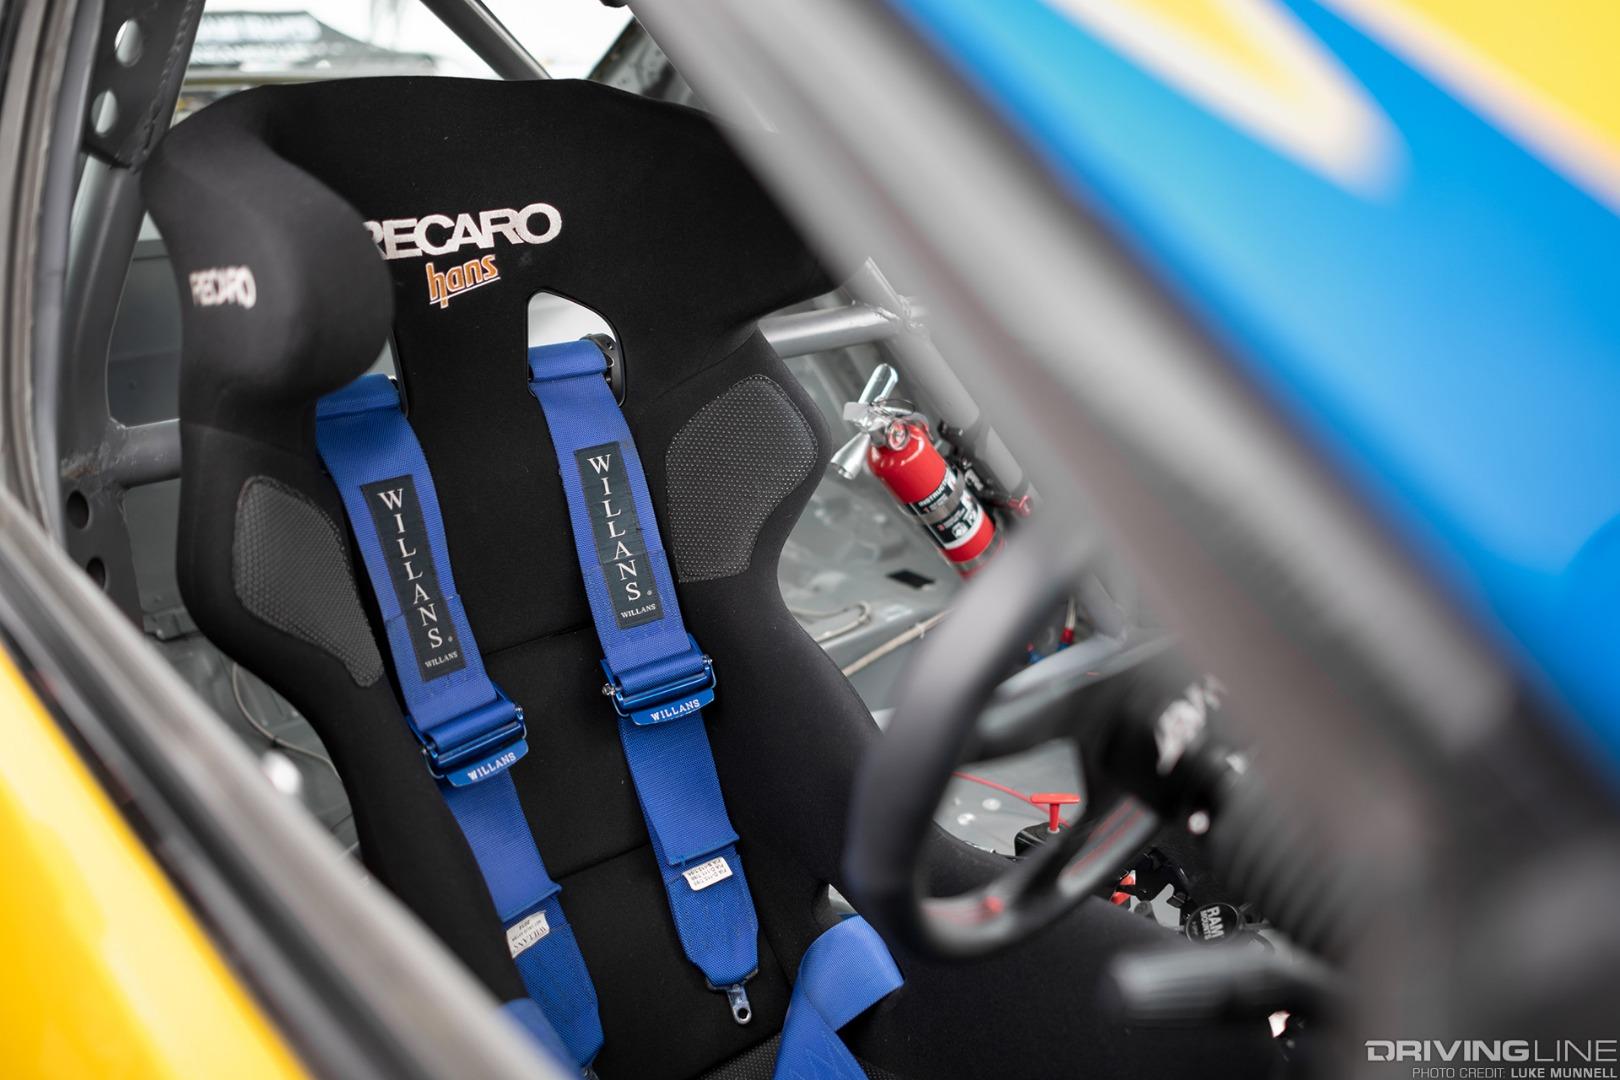 hight resolution of honda spoon accord euro r interior recaro hans seat and willans belts photo credit luke munnell